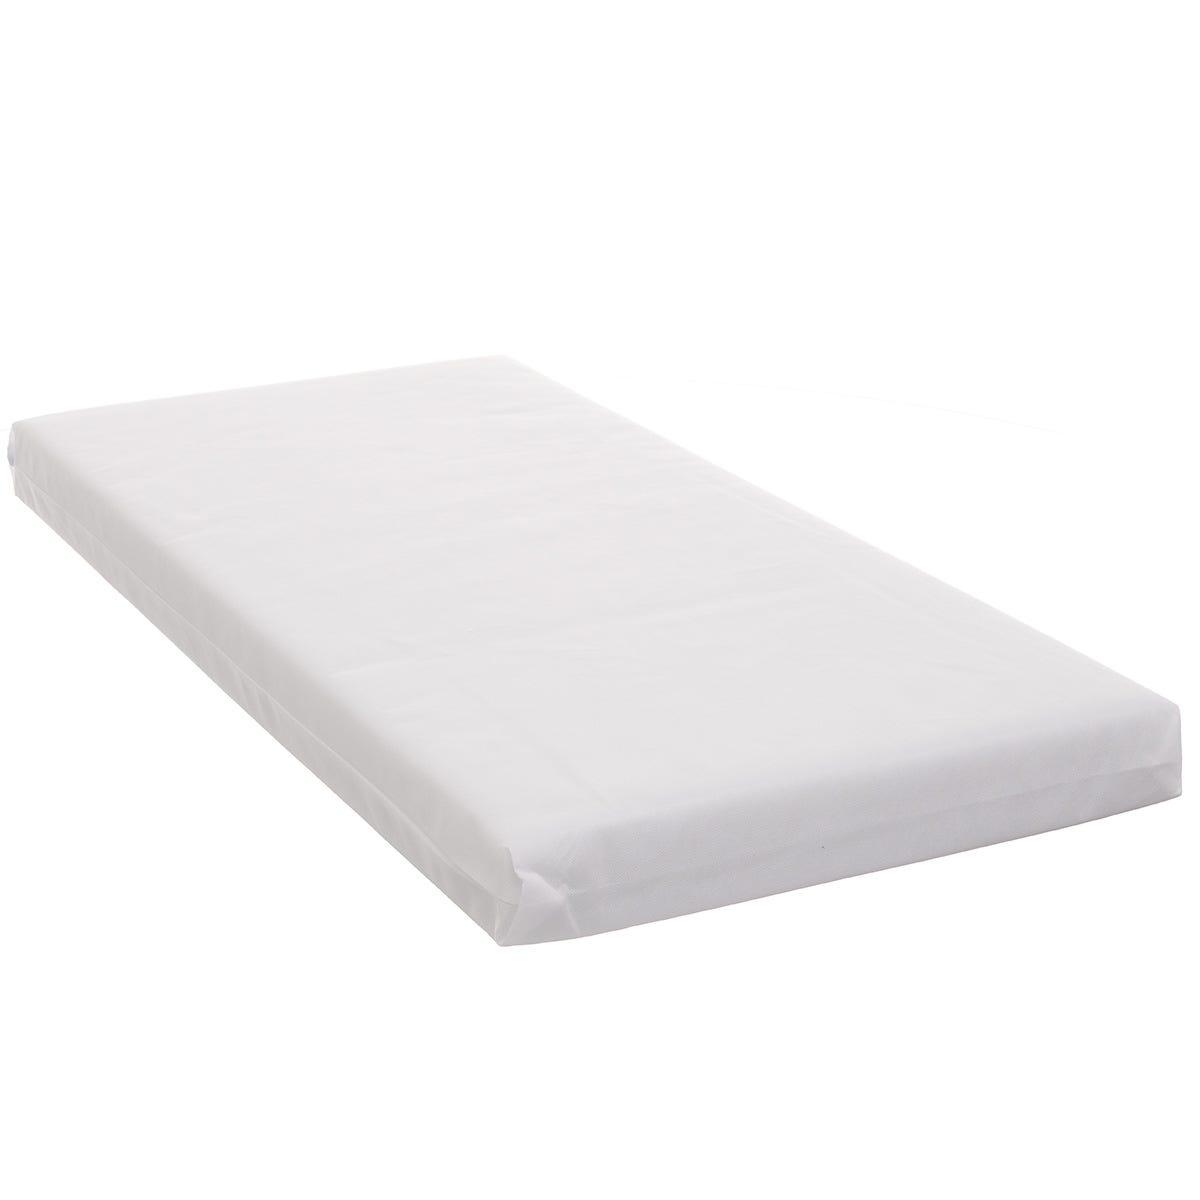 Obaby Foam 100 X 50 Space Saver Cot Mattress